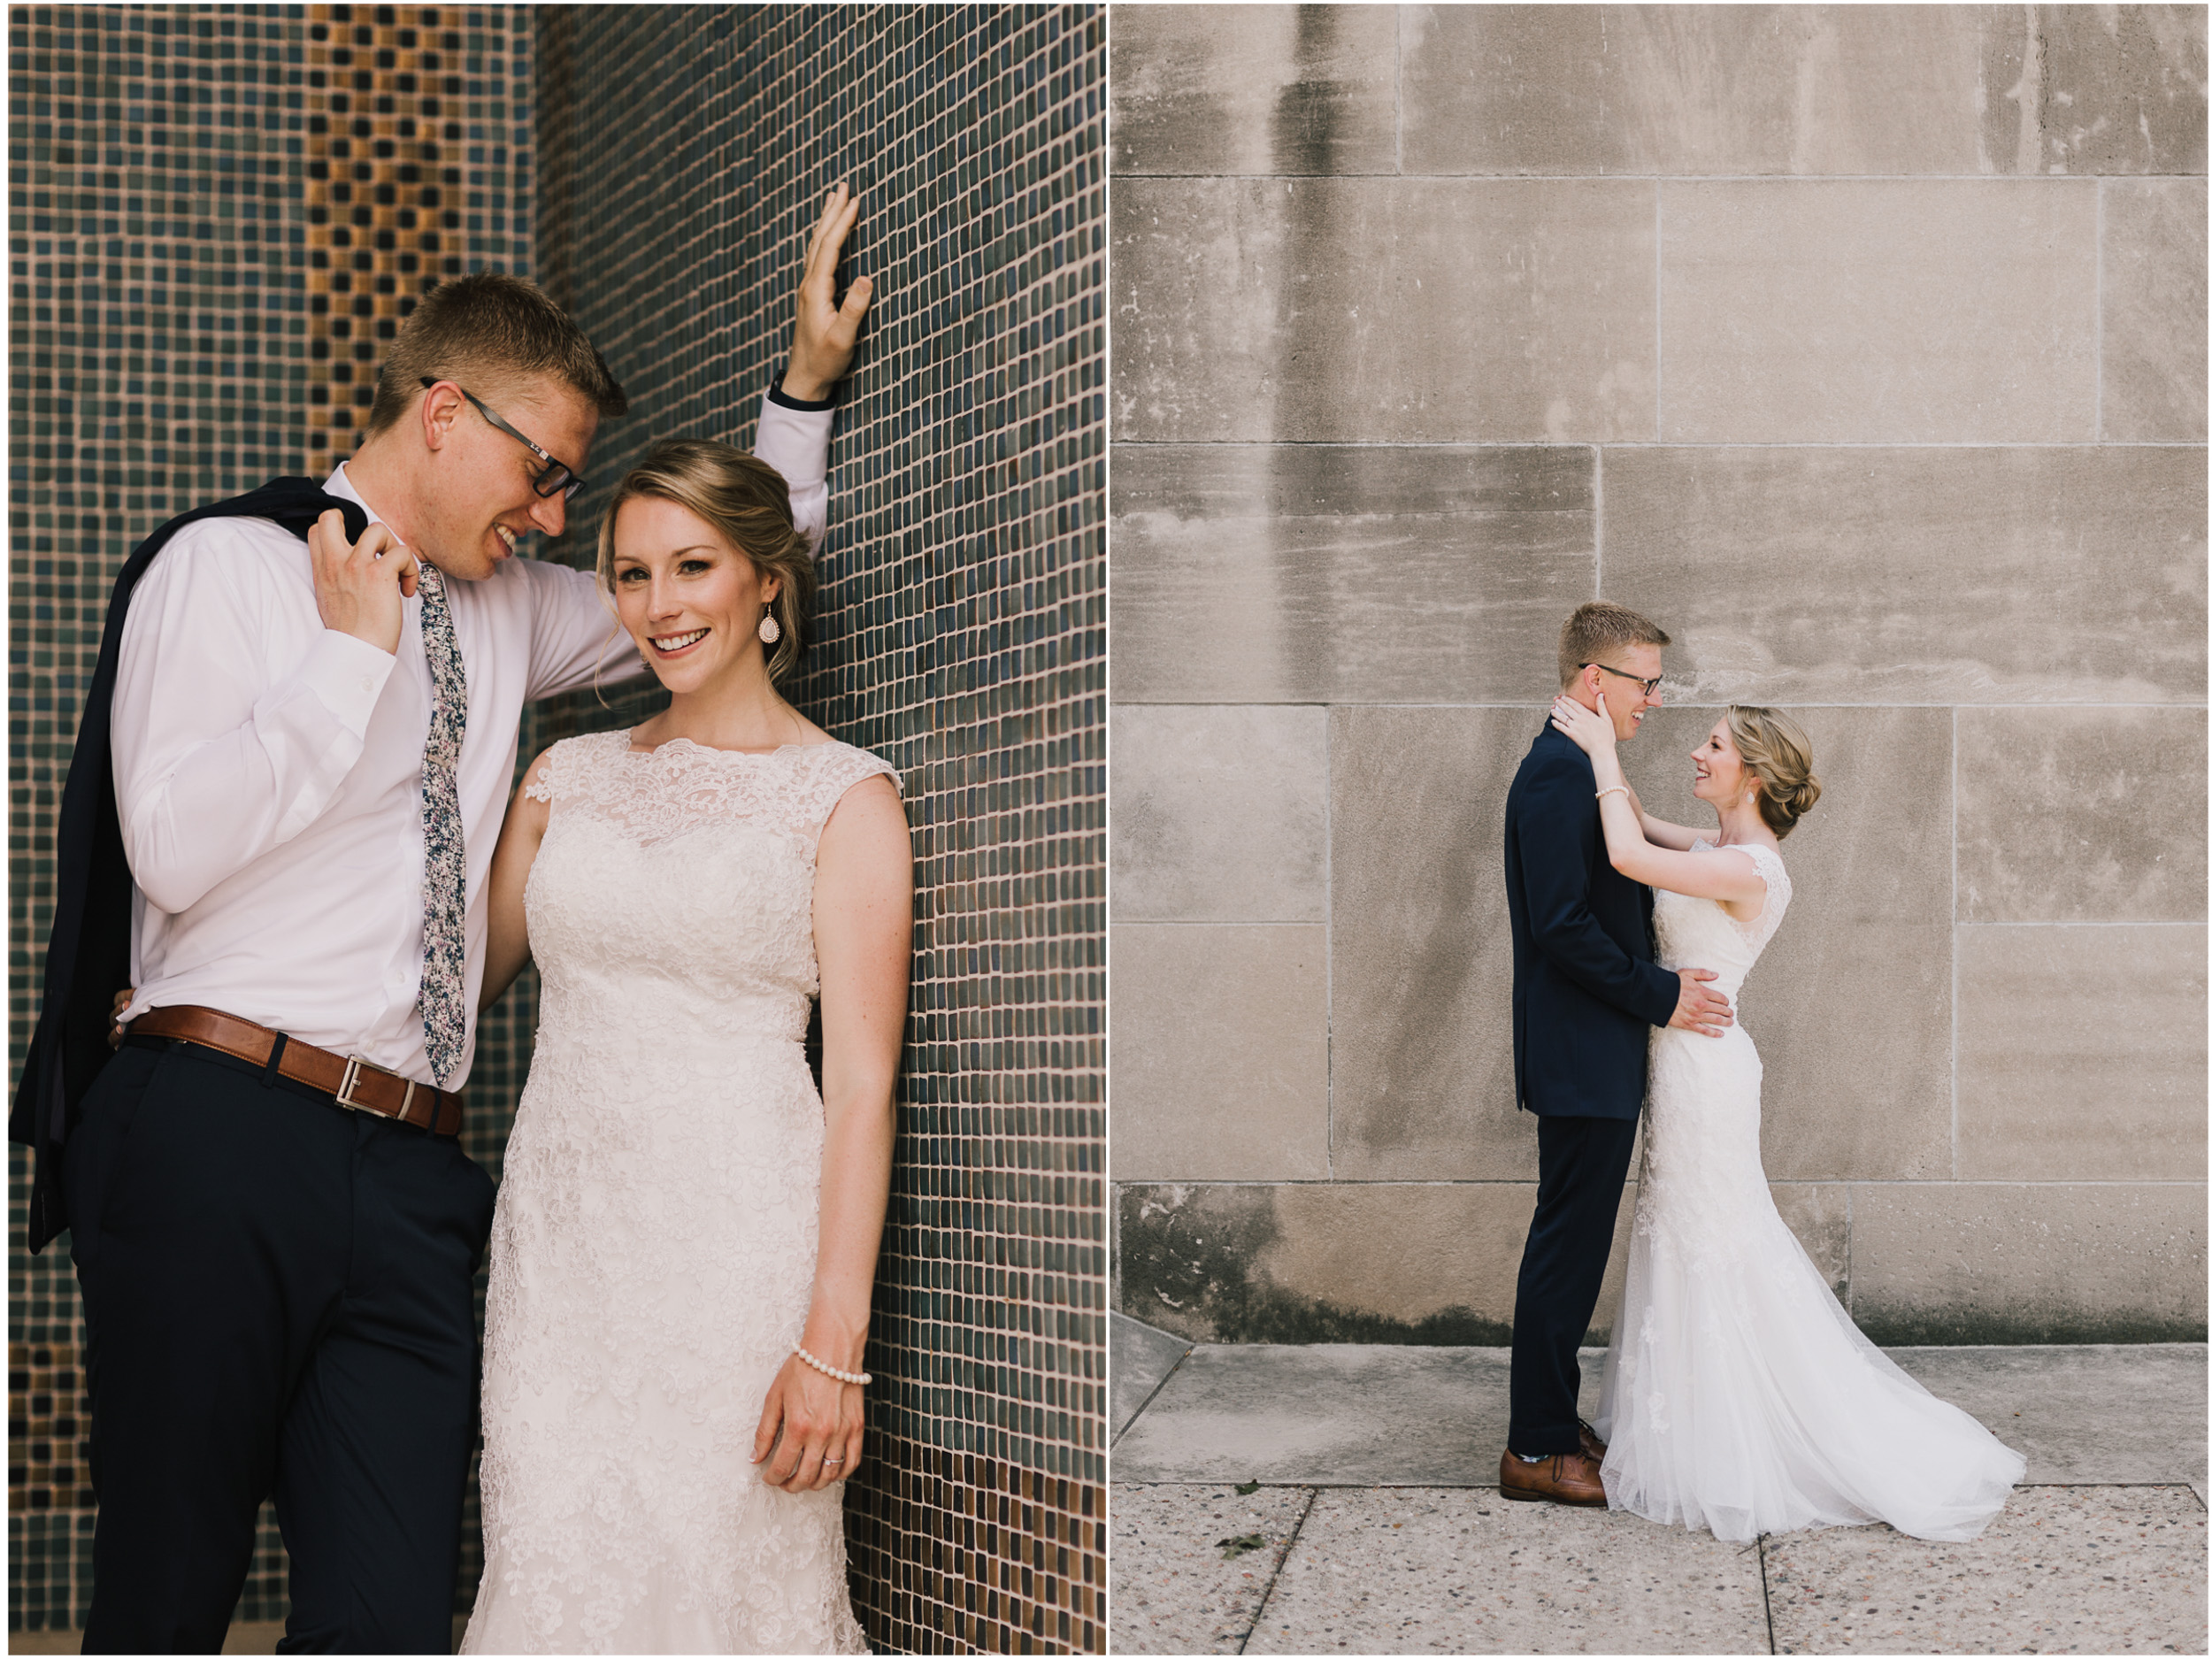 alyssa barletter photography classic kansas city summer wedding photographer dustin and erica king-21.jpg